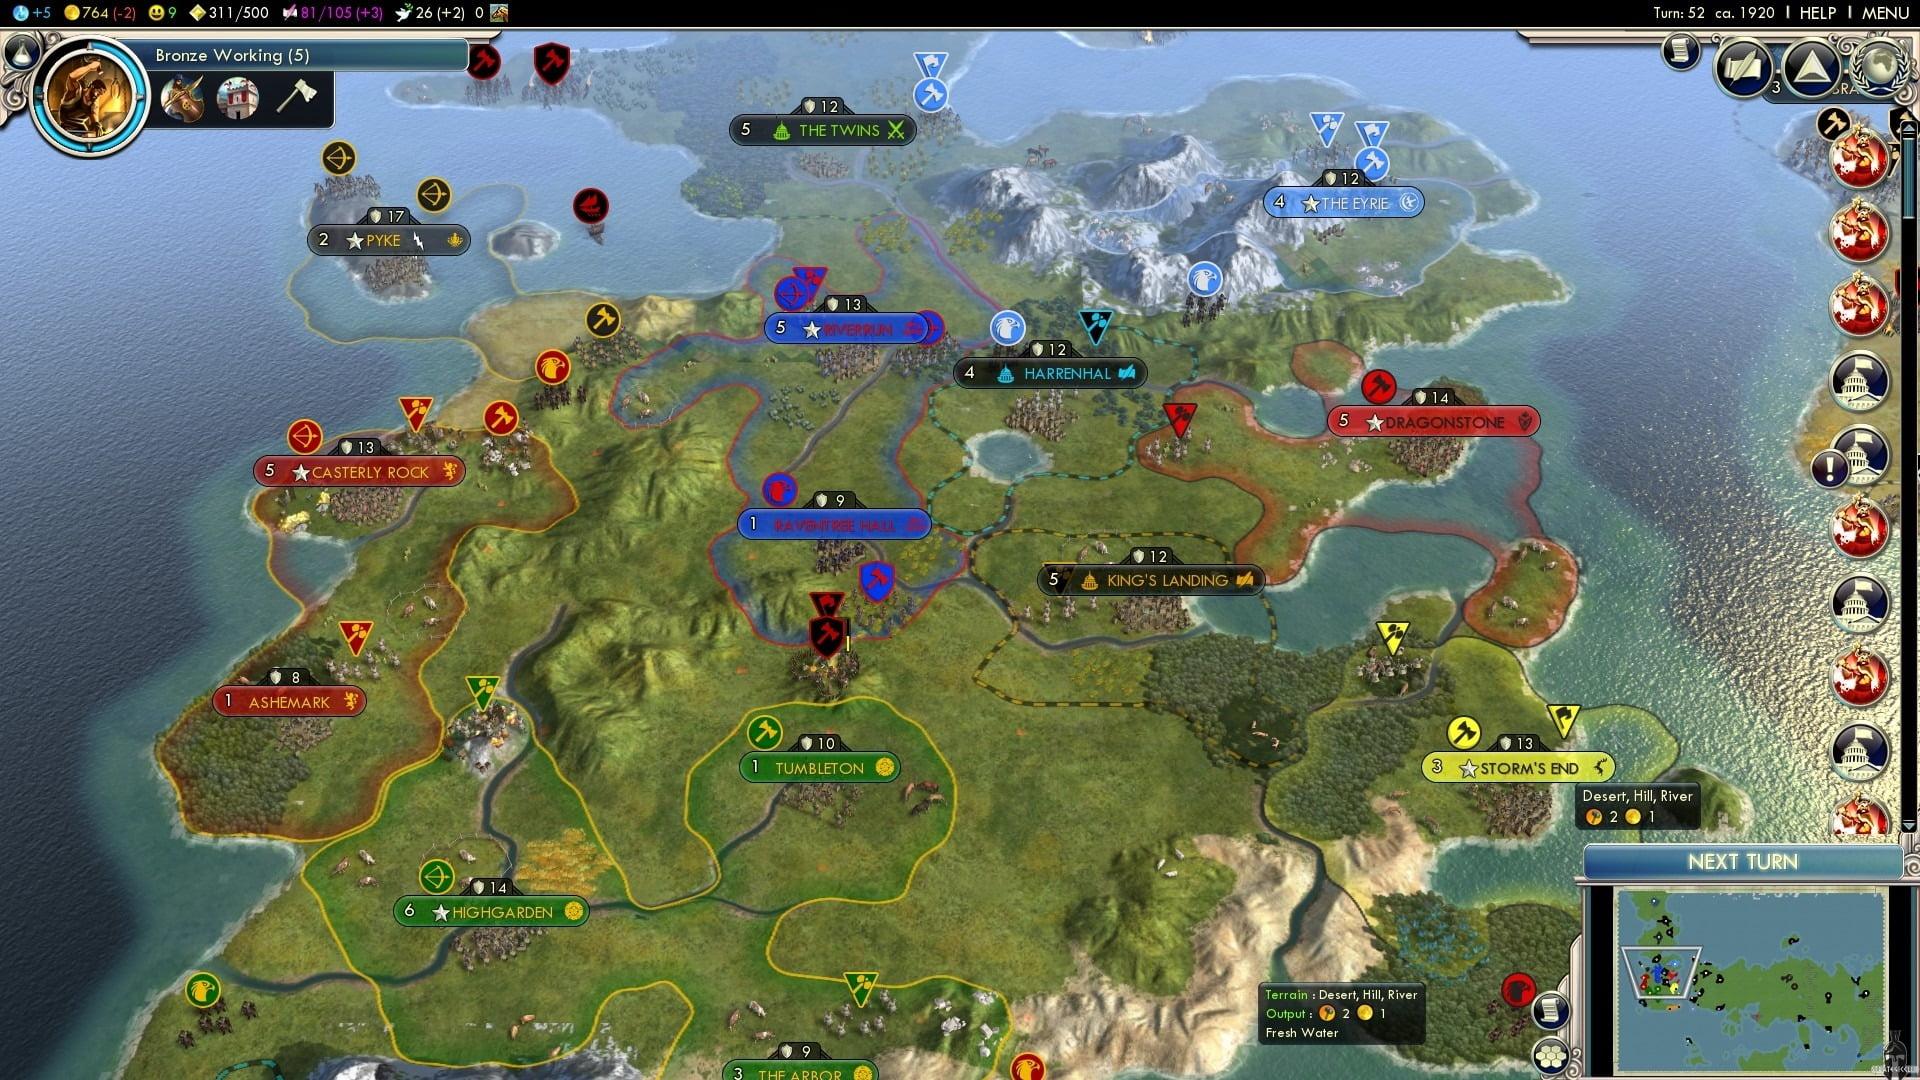 steamworkshop webupload previewfile  preview